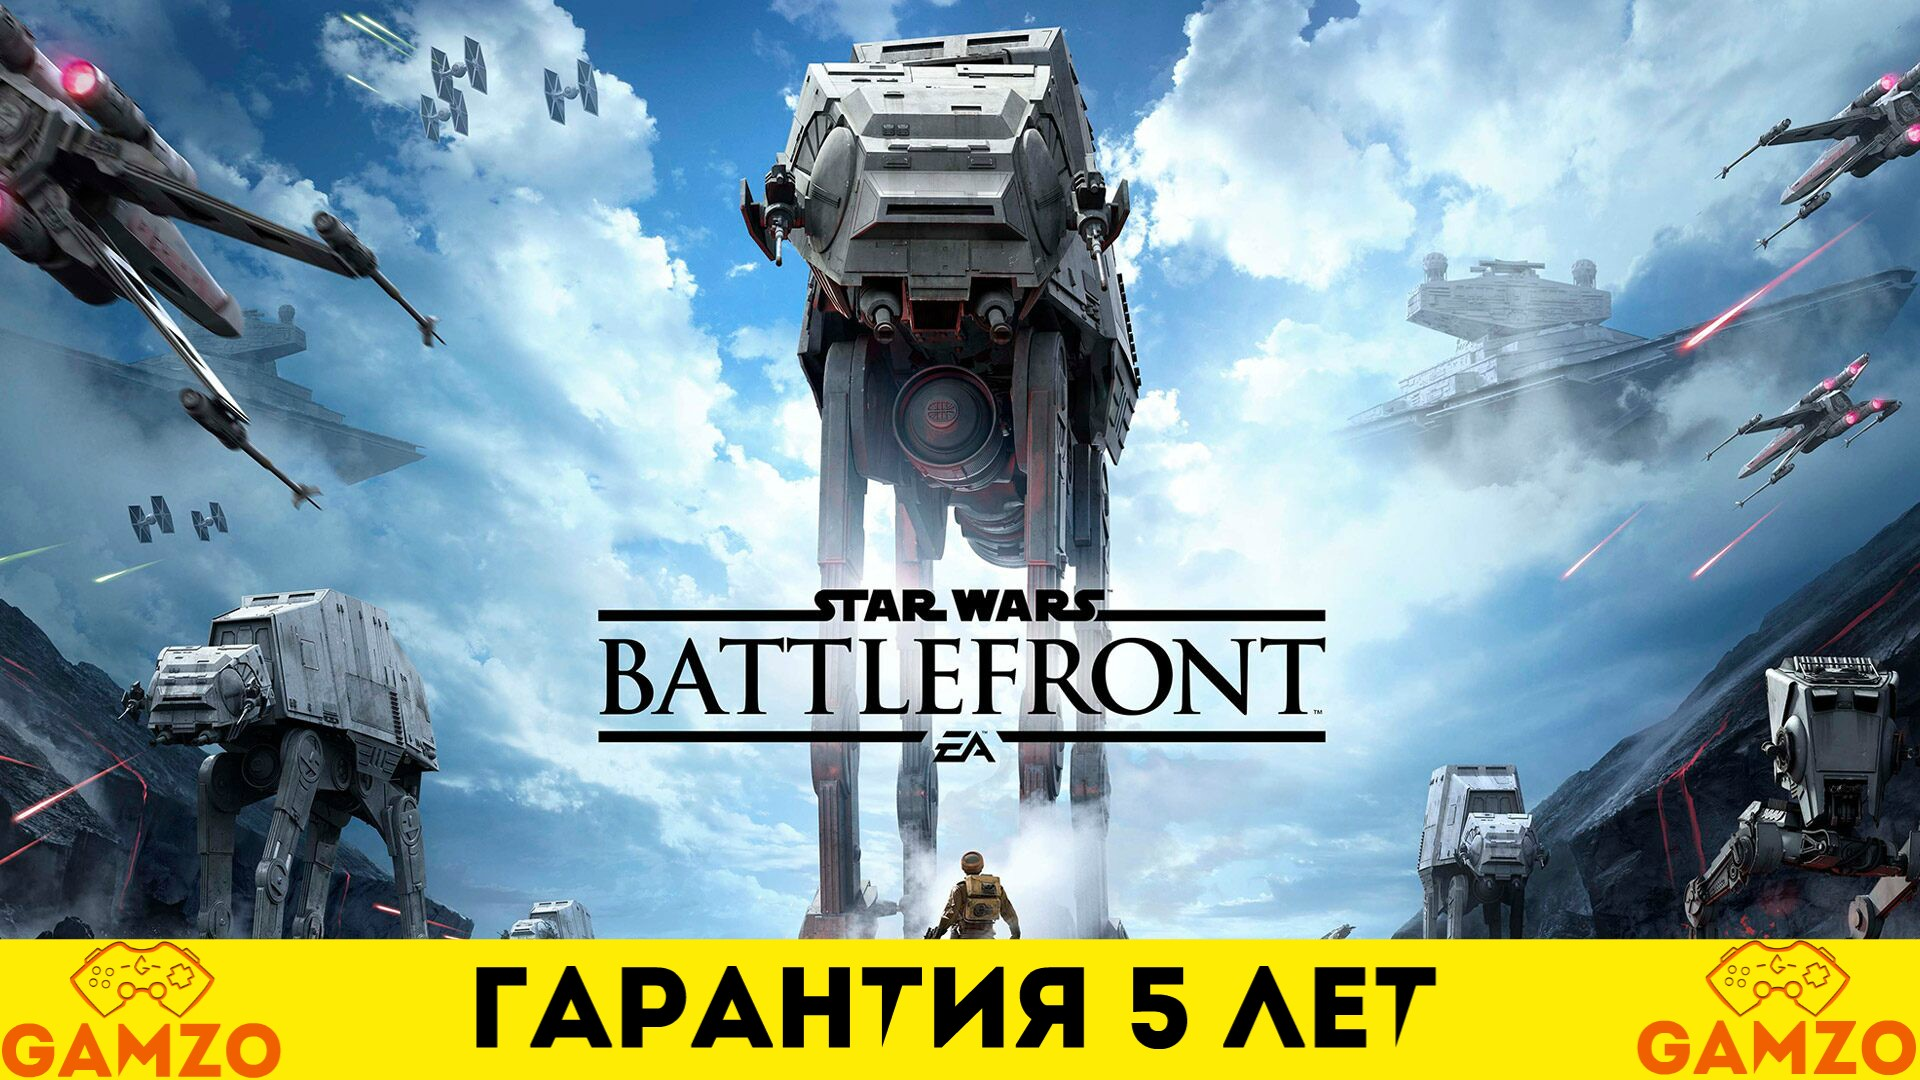 Star Wars™ Battlefront | Гарантия 5 лет | + Подарок bf4